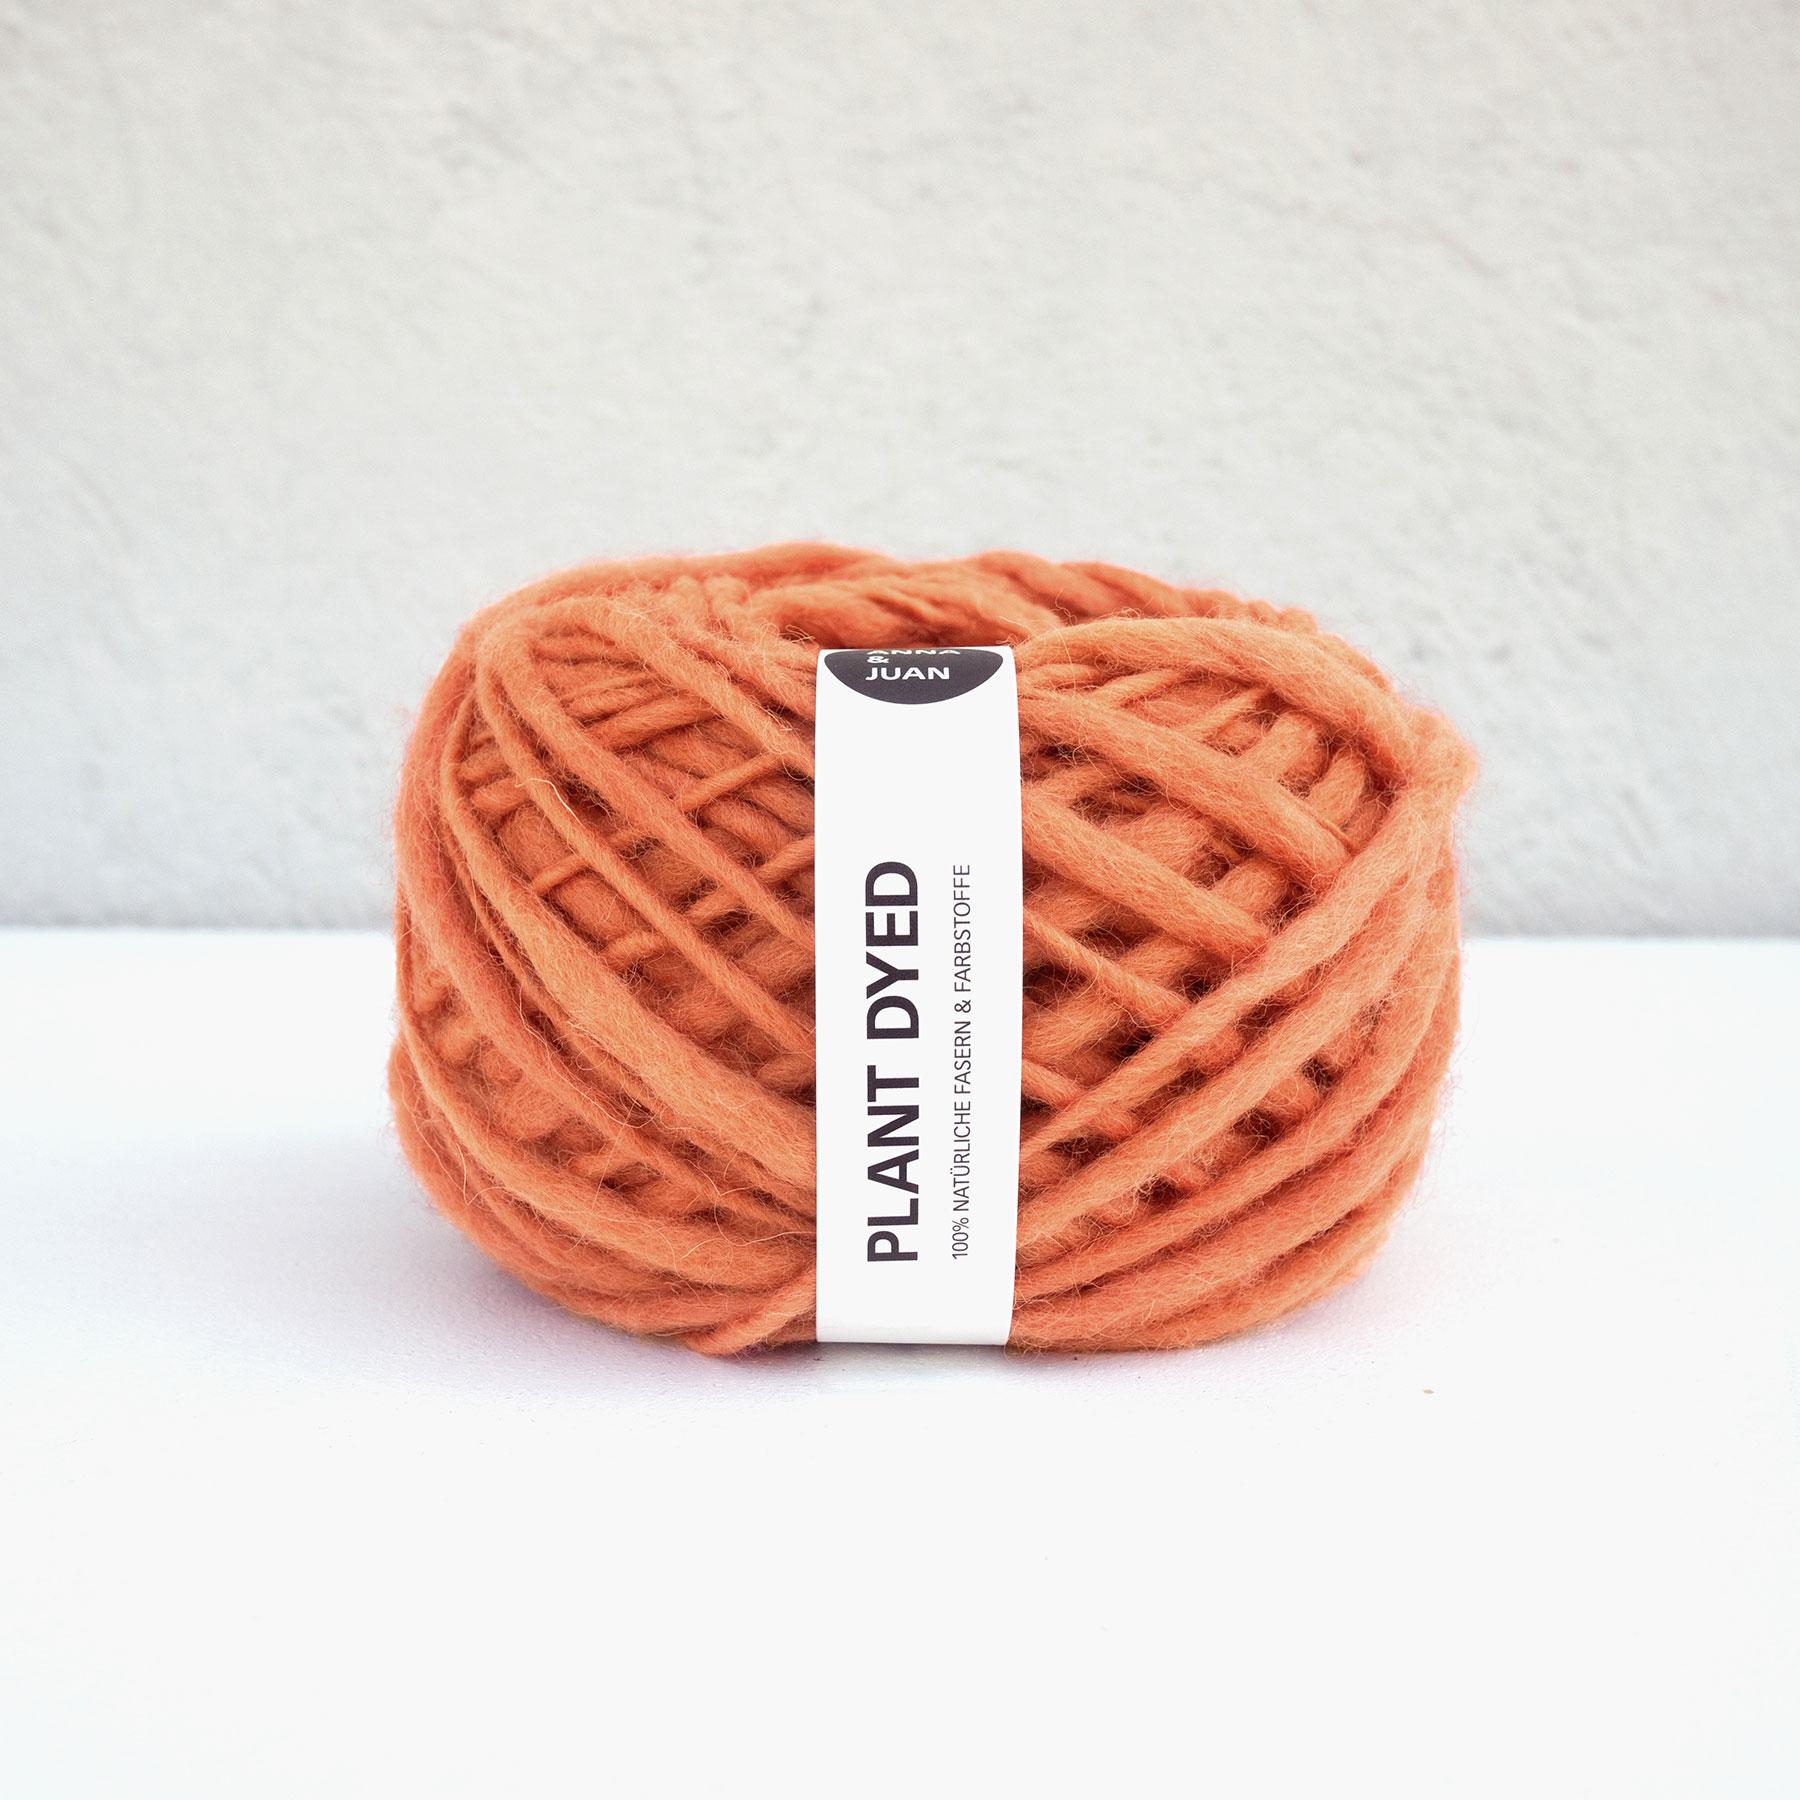 Anna & Juan Wolle «Plant Dyed» – Merino Handgesponnen – Super Bulky – Rotorange